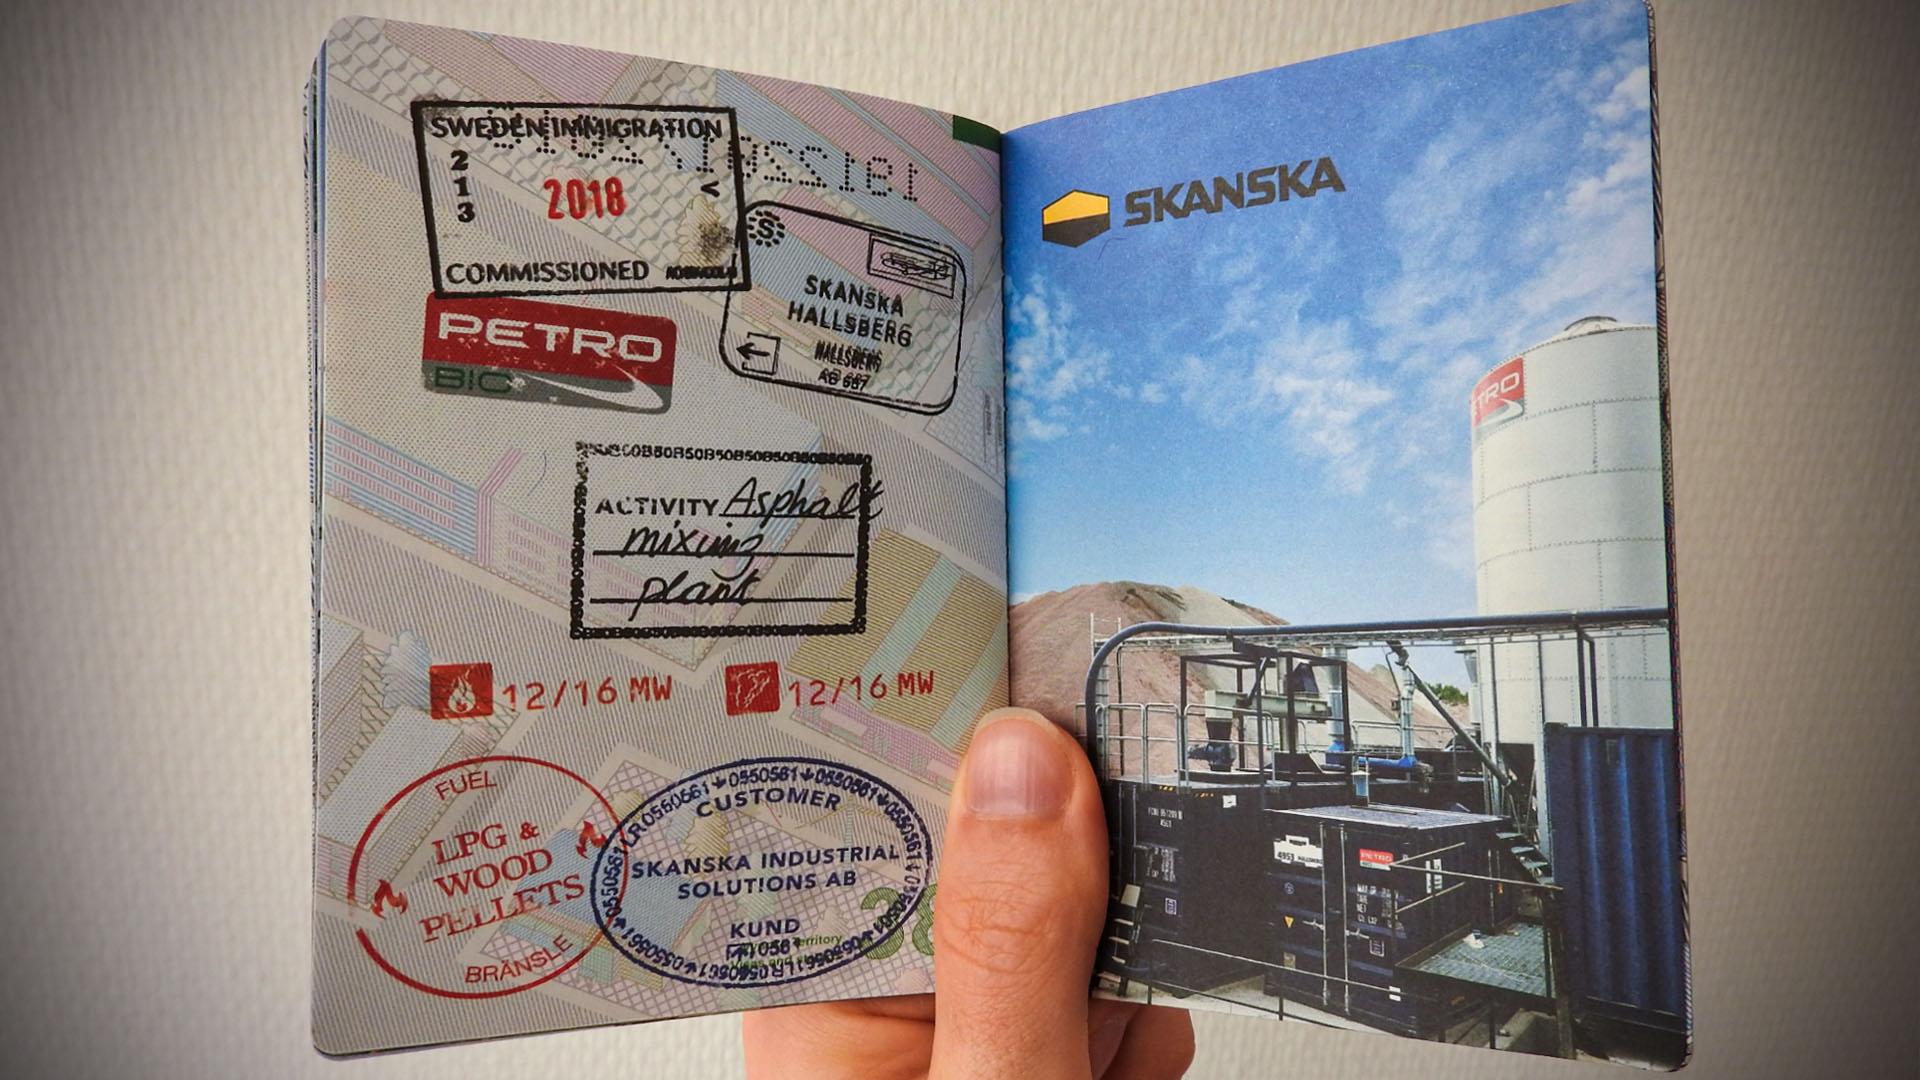 Passport Inside